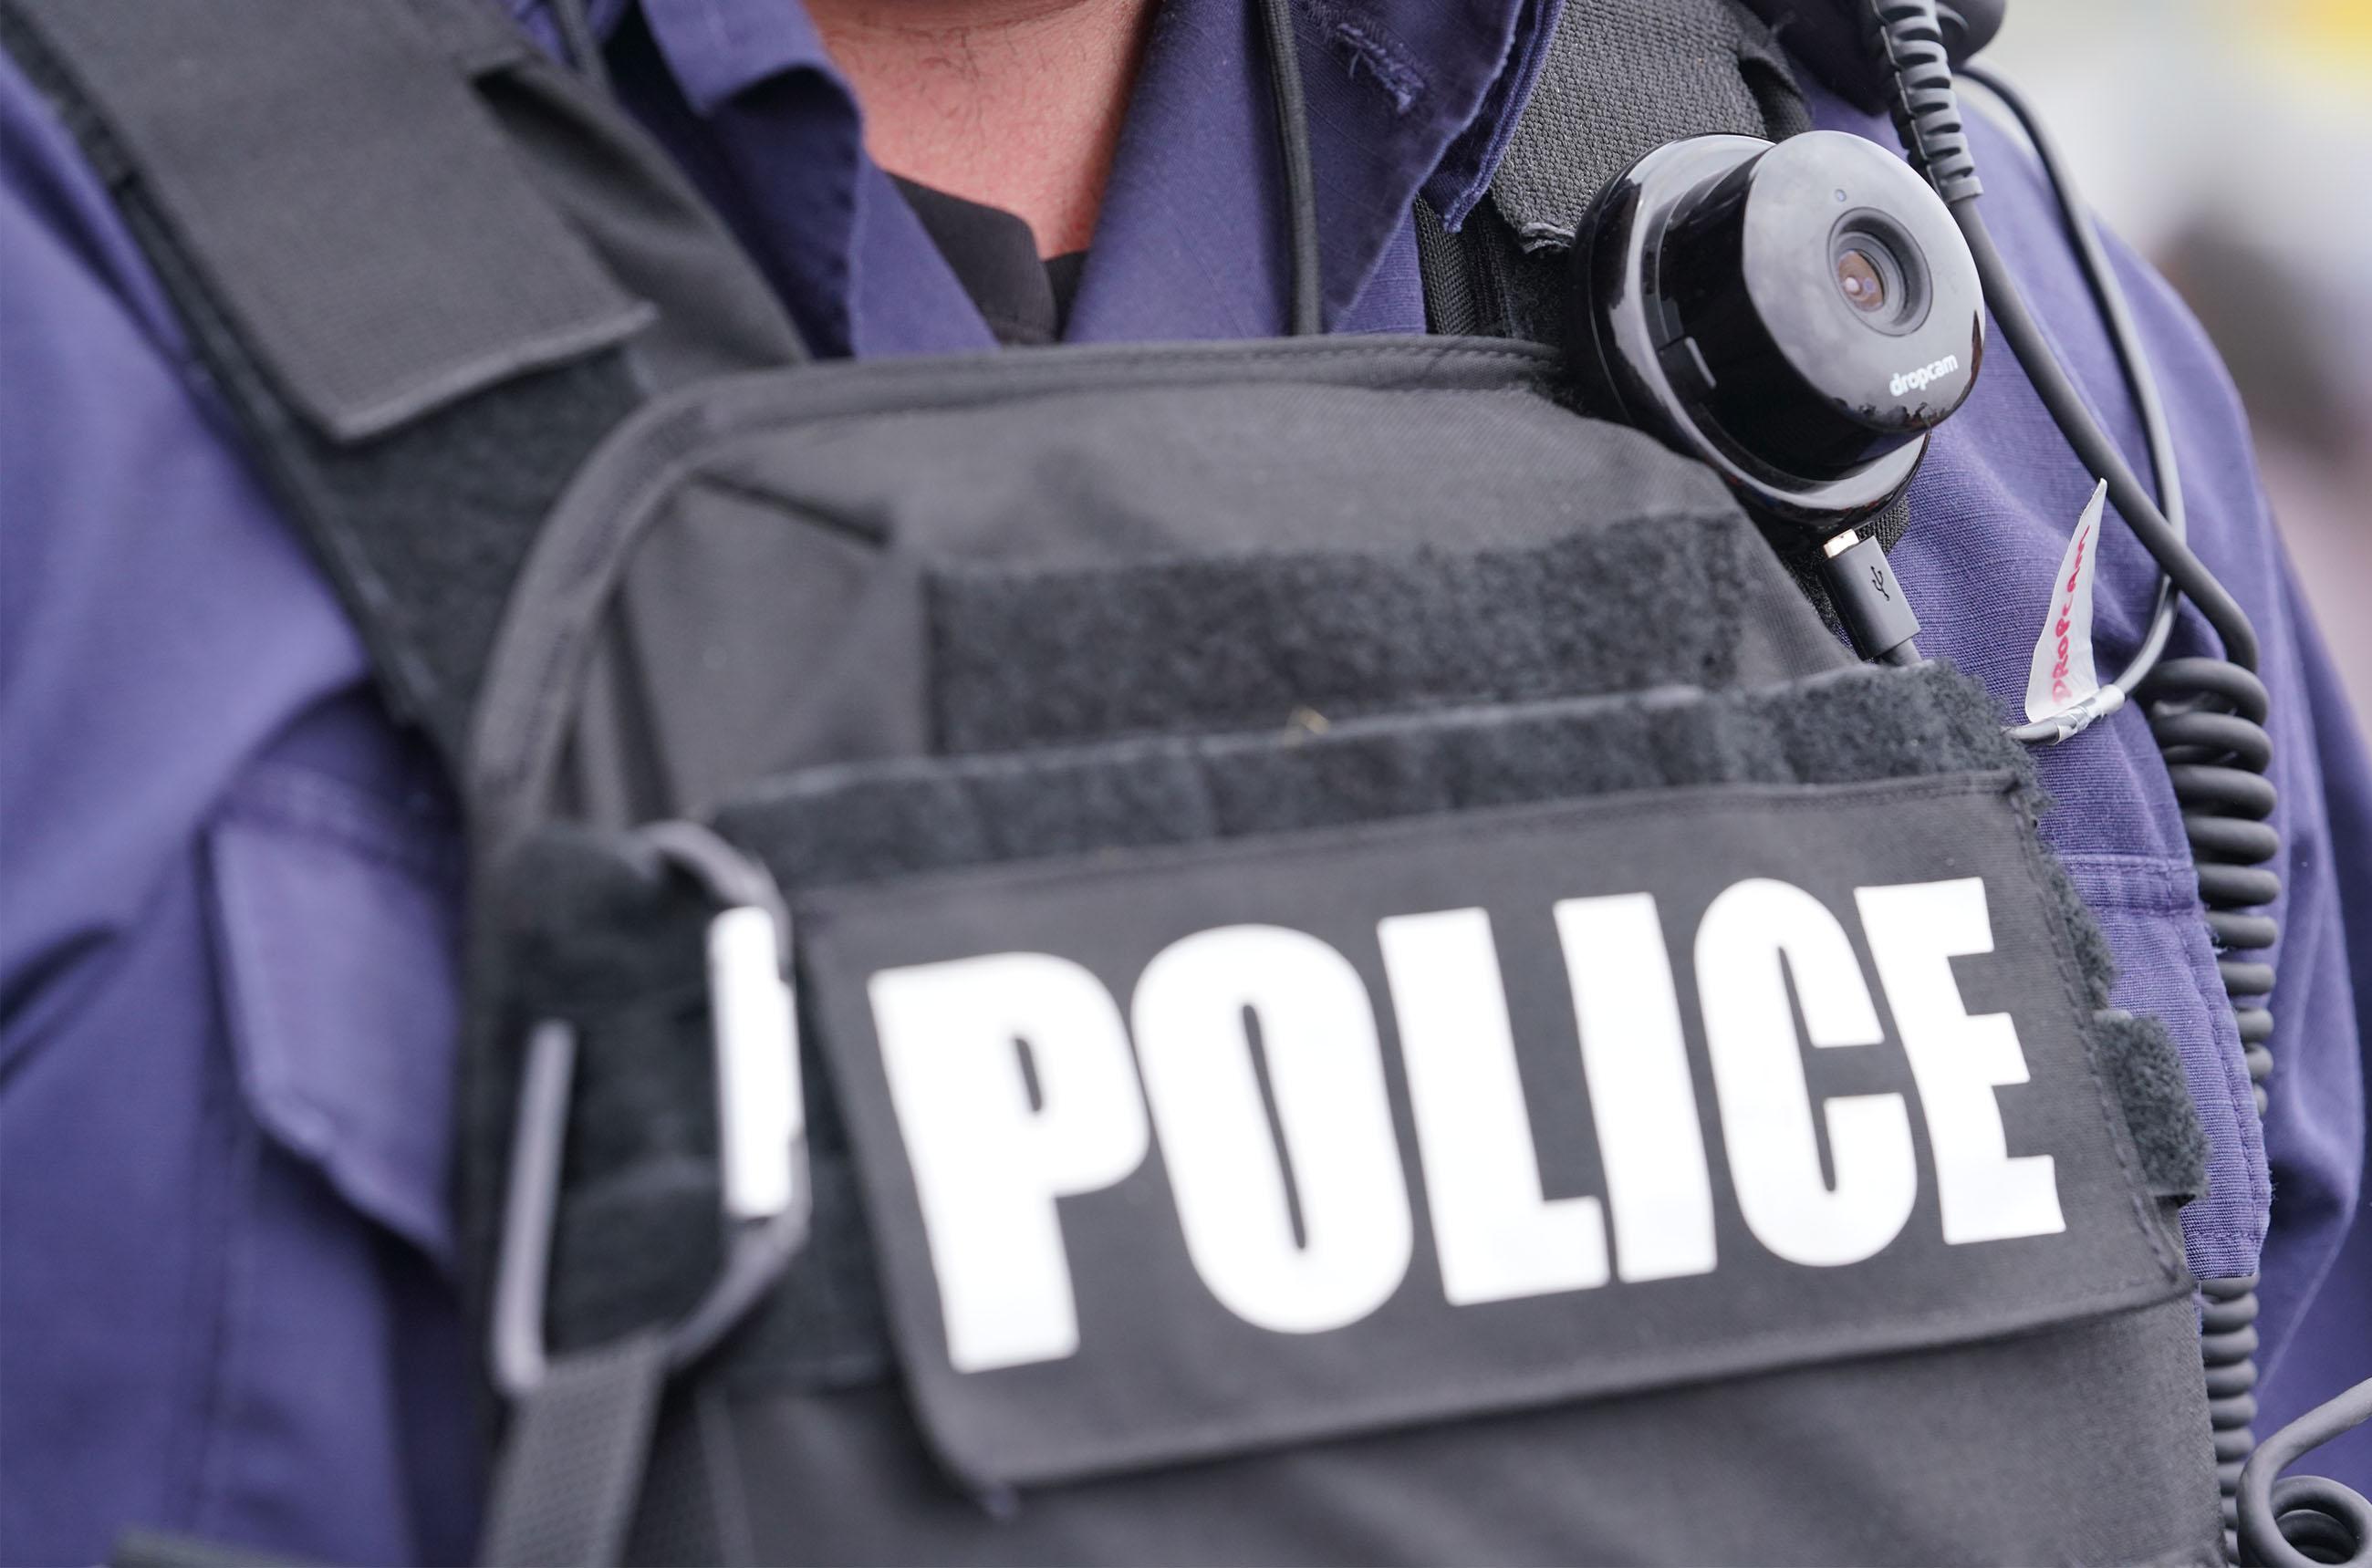 Hawaii Judge Blocks Police Union Attempt To Keep Cop Misconduct Secret